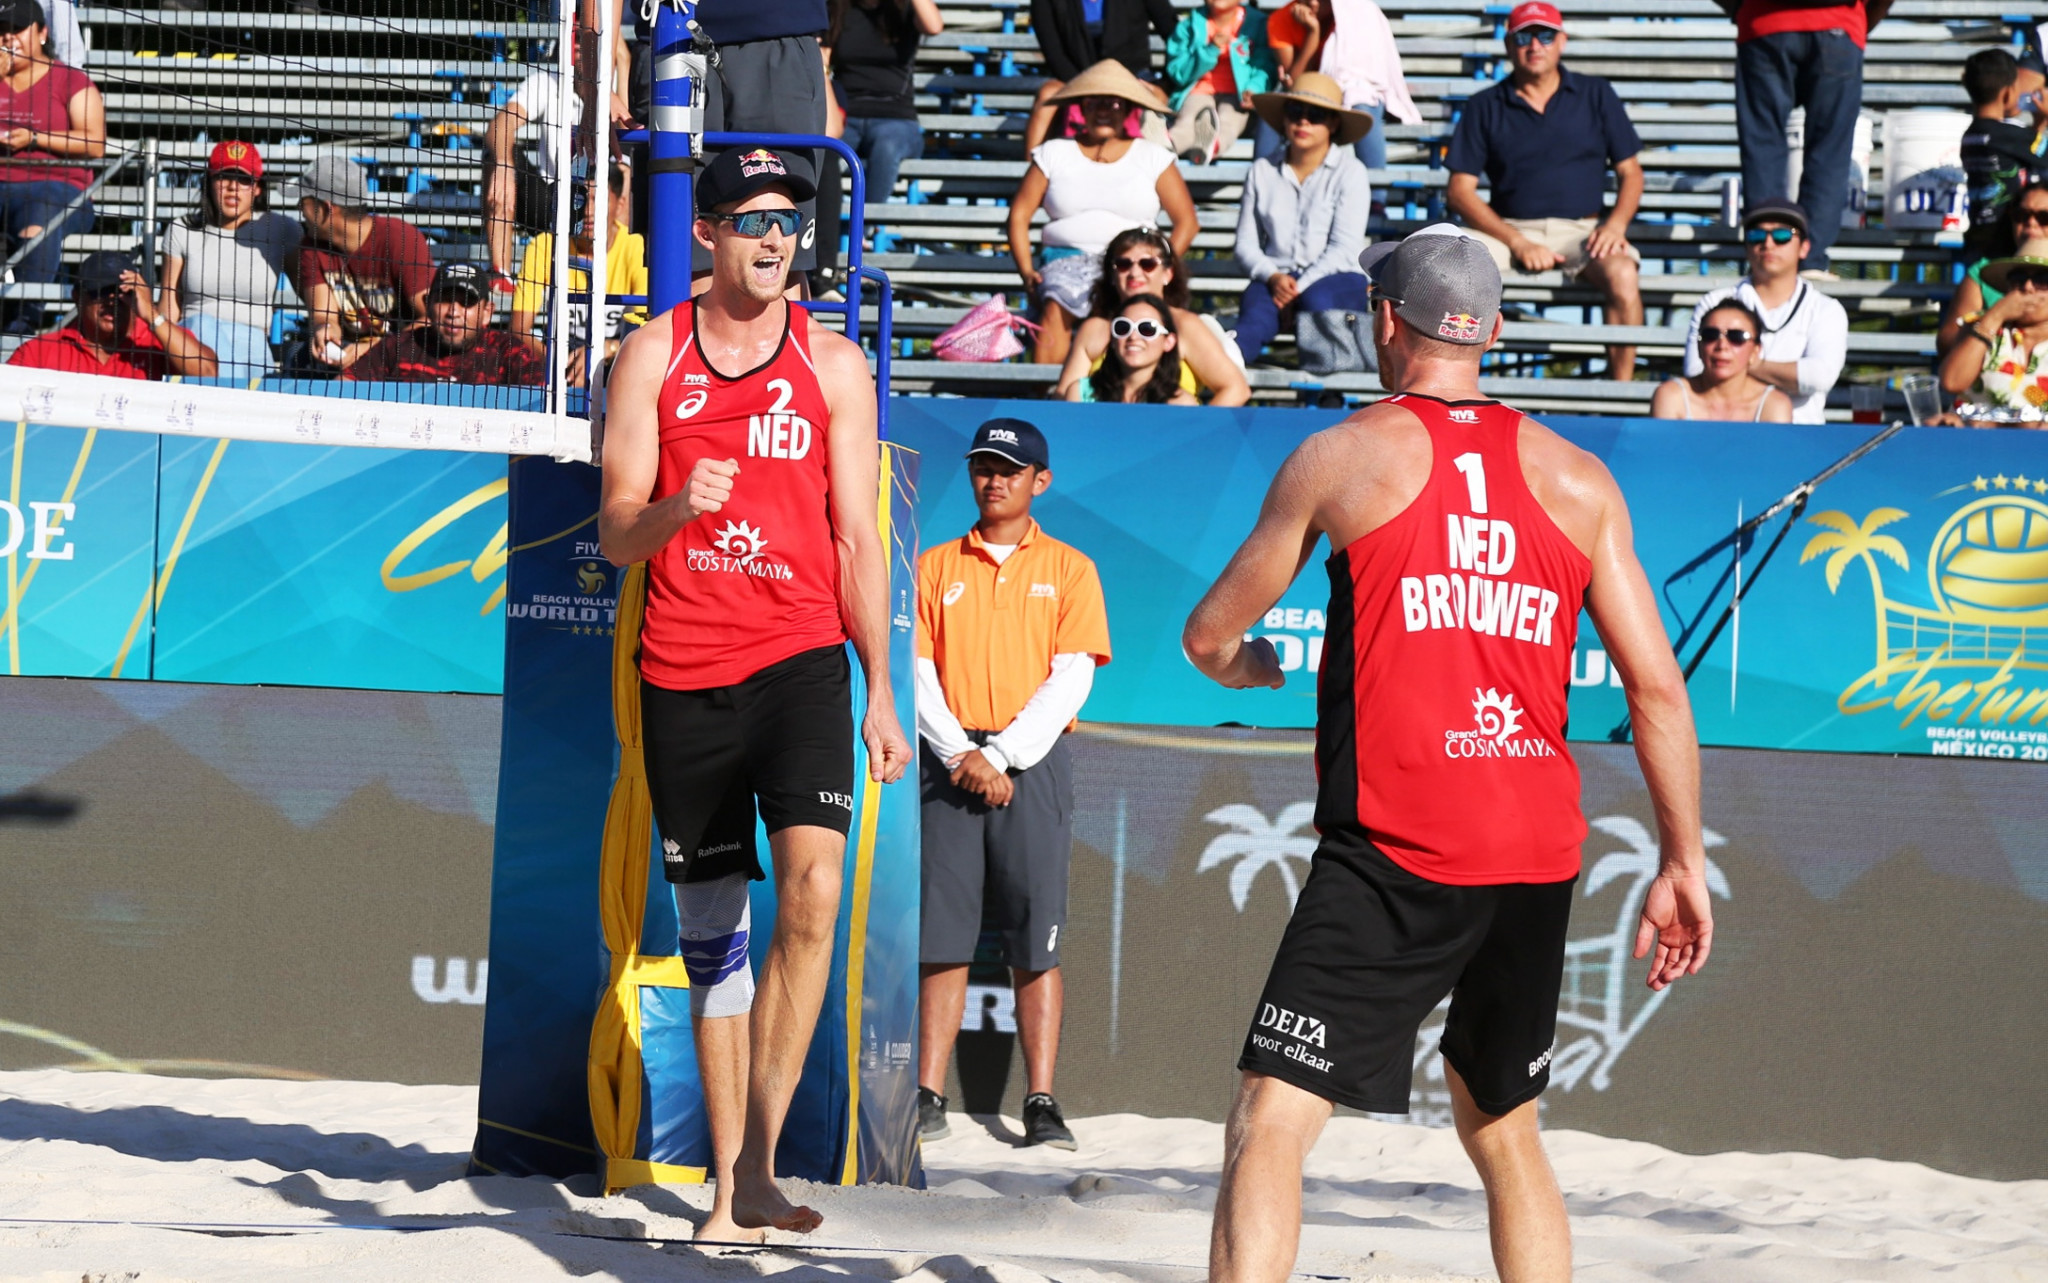 Top-seeded pair Alexander Brouwer and Robert Meeuwsen of The Netherlands made the men's final ©FIVB